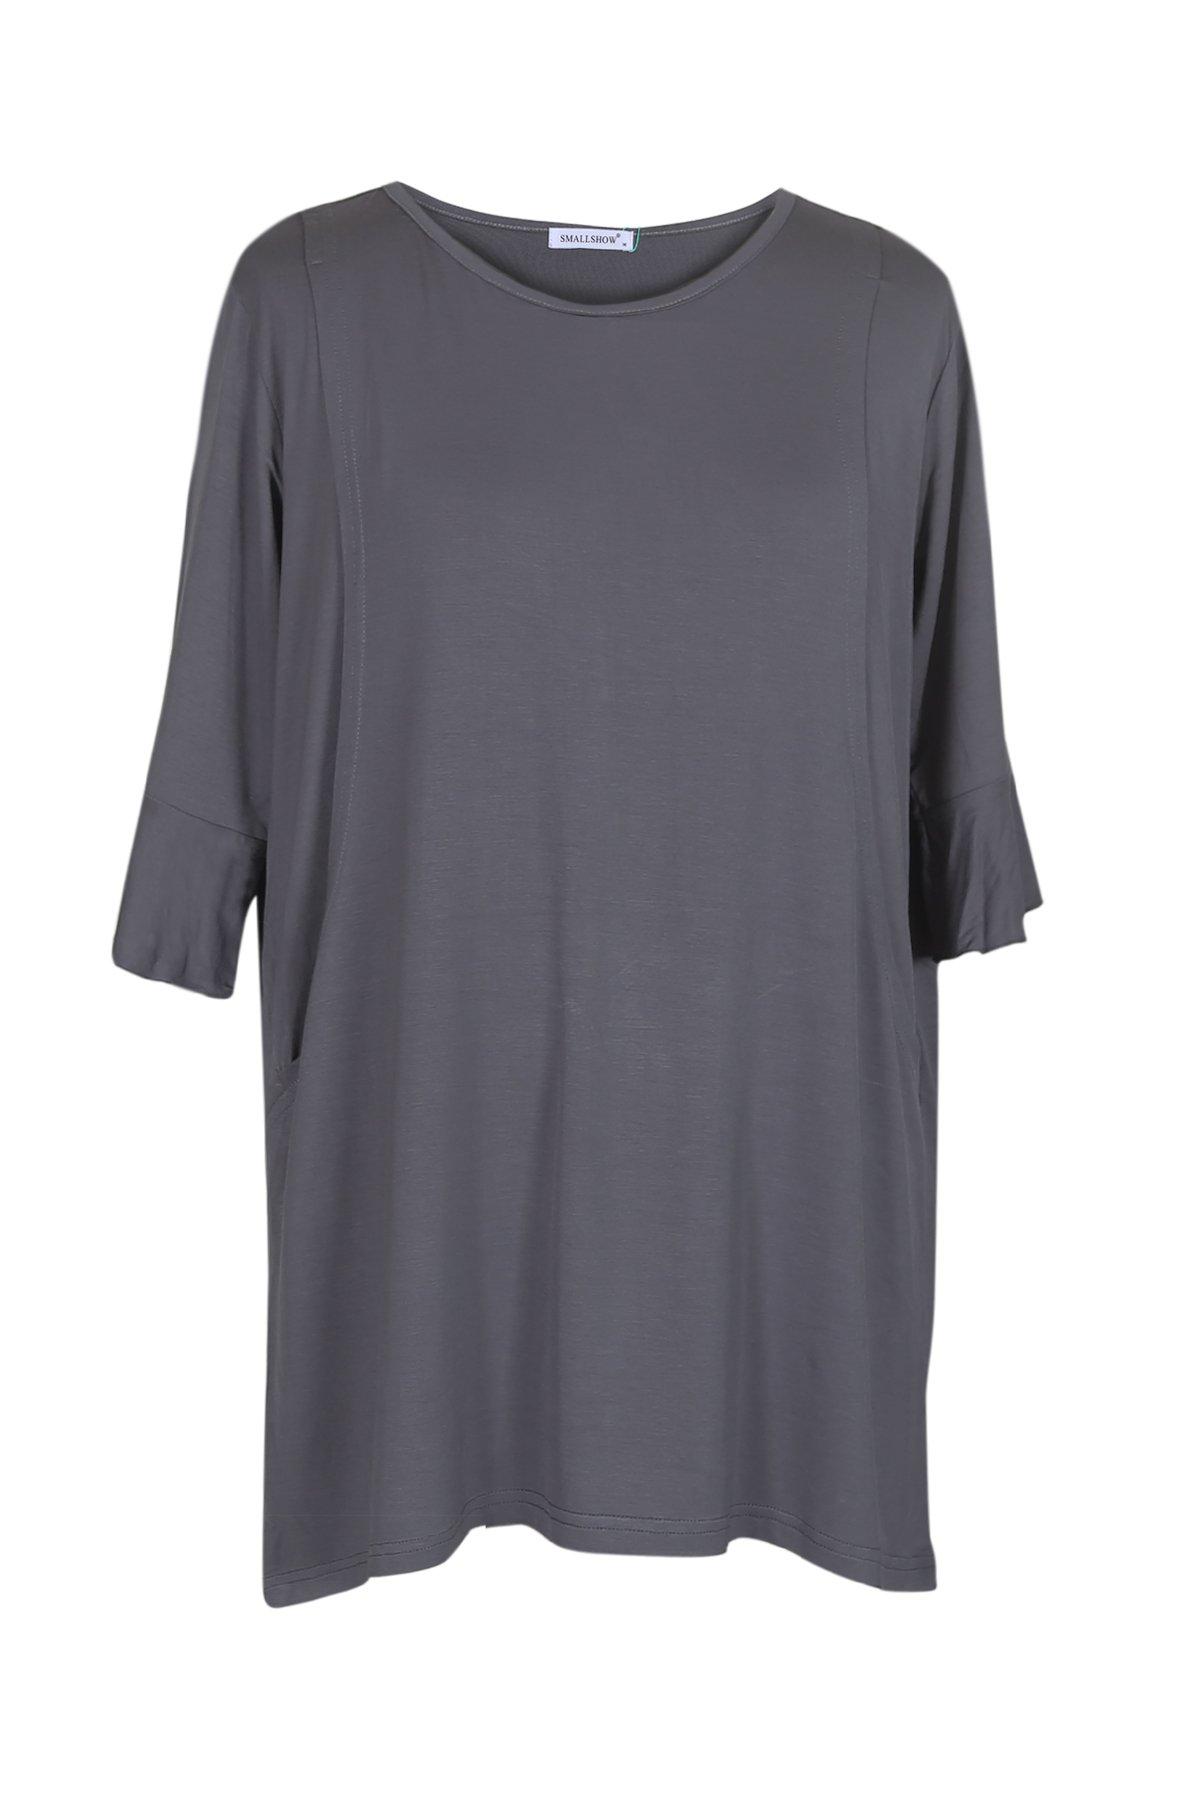 Smallshow Women's Nursing Tops Breastfeeding Clothes Medium Deep Grey